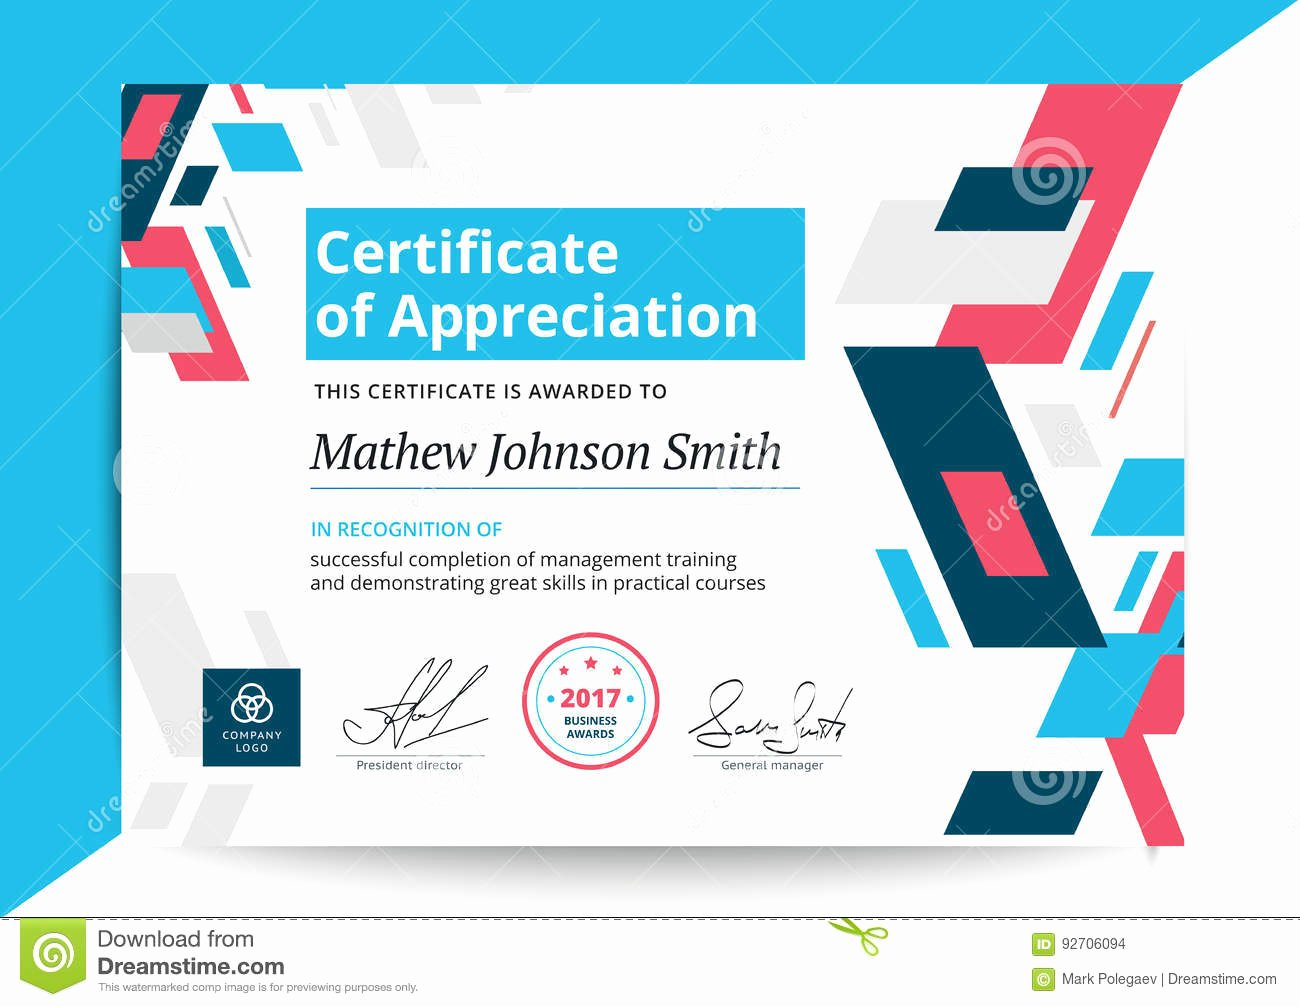 Certificate Of Appreciation Graduation Best Of Certificate Appreciation Template In Modern Design